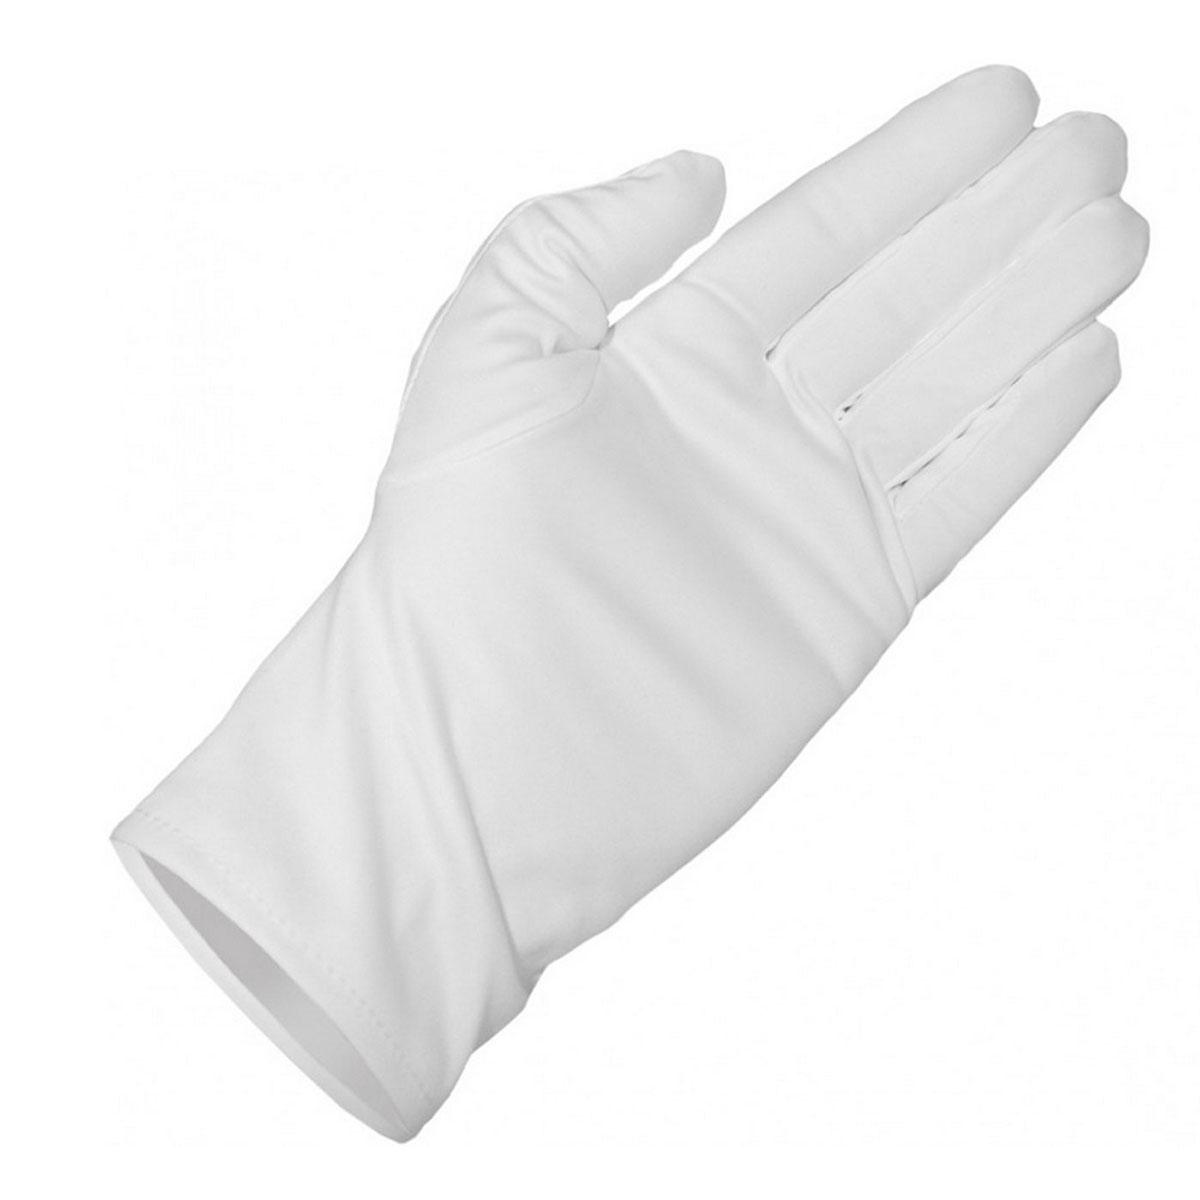 B.I.G. Microfaser Handschuhe Größe XL, 10 Paar